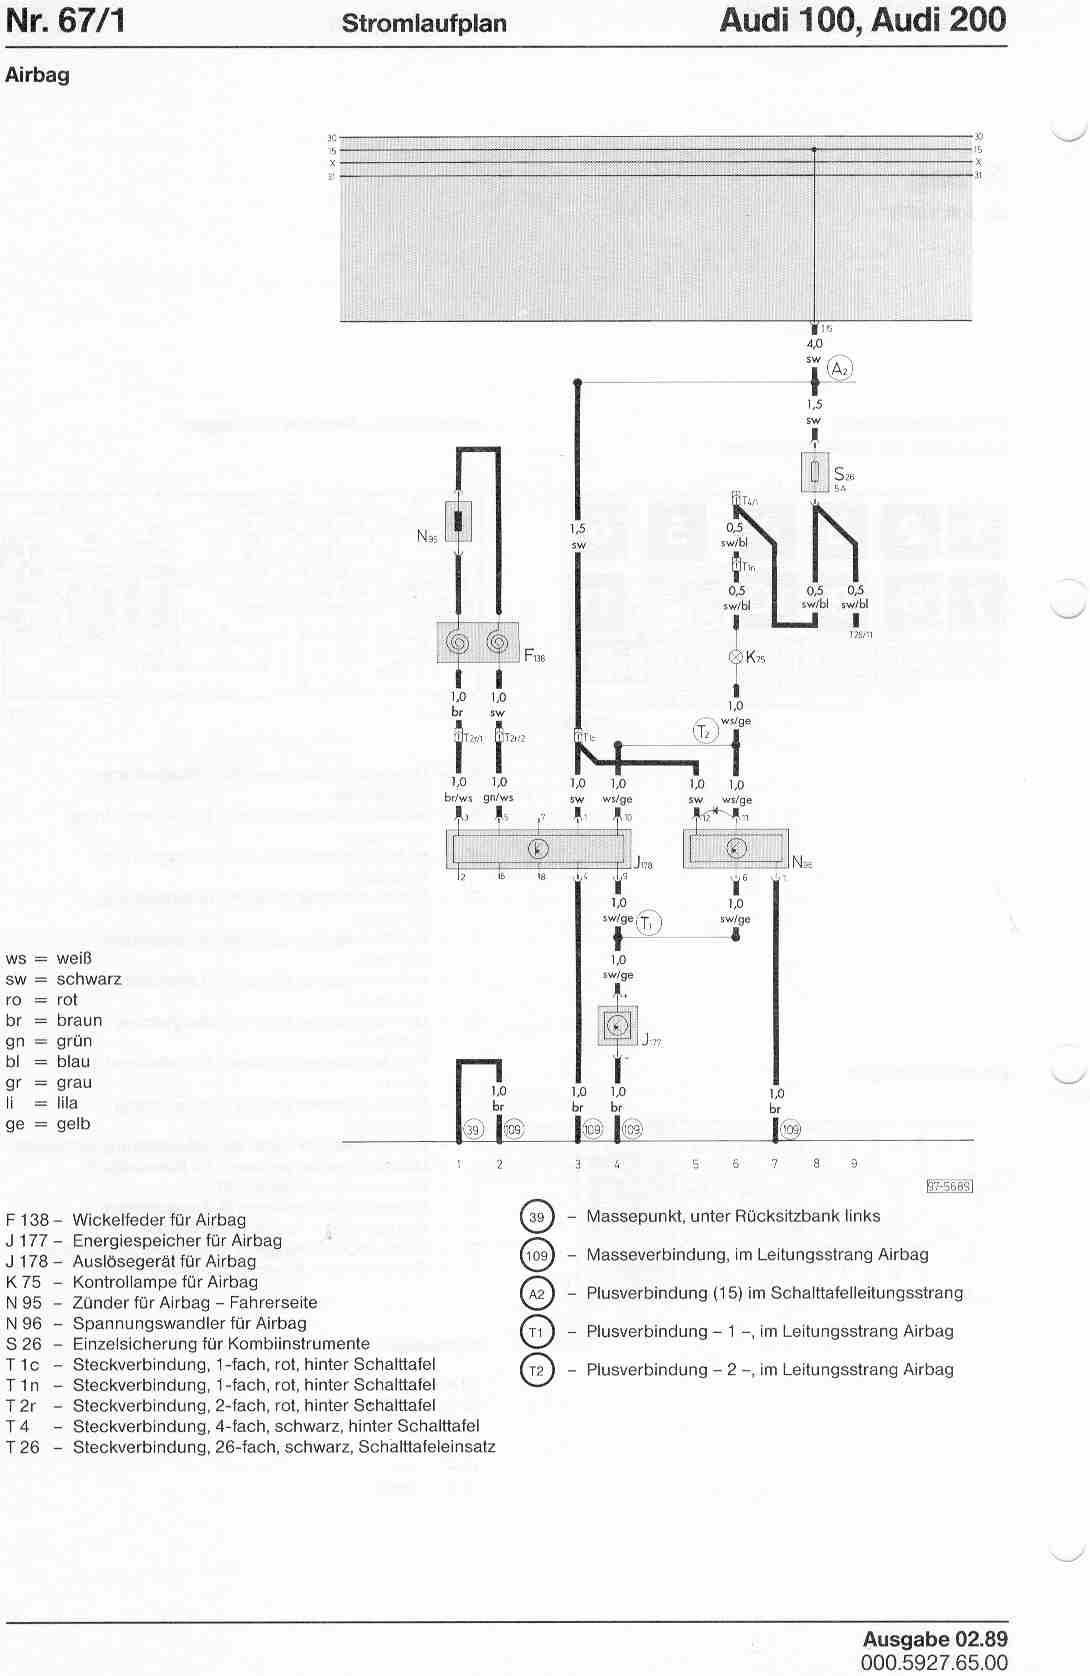 KB_7820] 1993 Audi 100 Wiring Diagram Schematic WiringEmbo Inst Crove Bletu Benol Mohammedshrine Librar Wiring 101